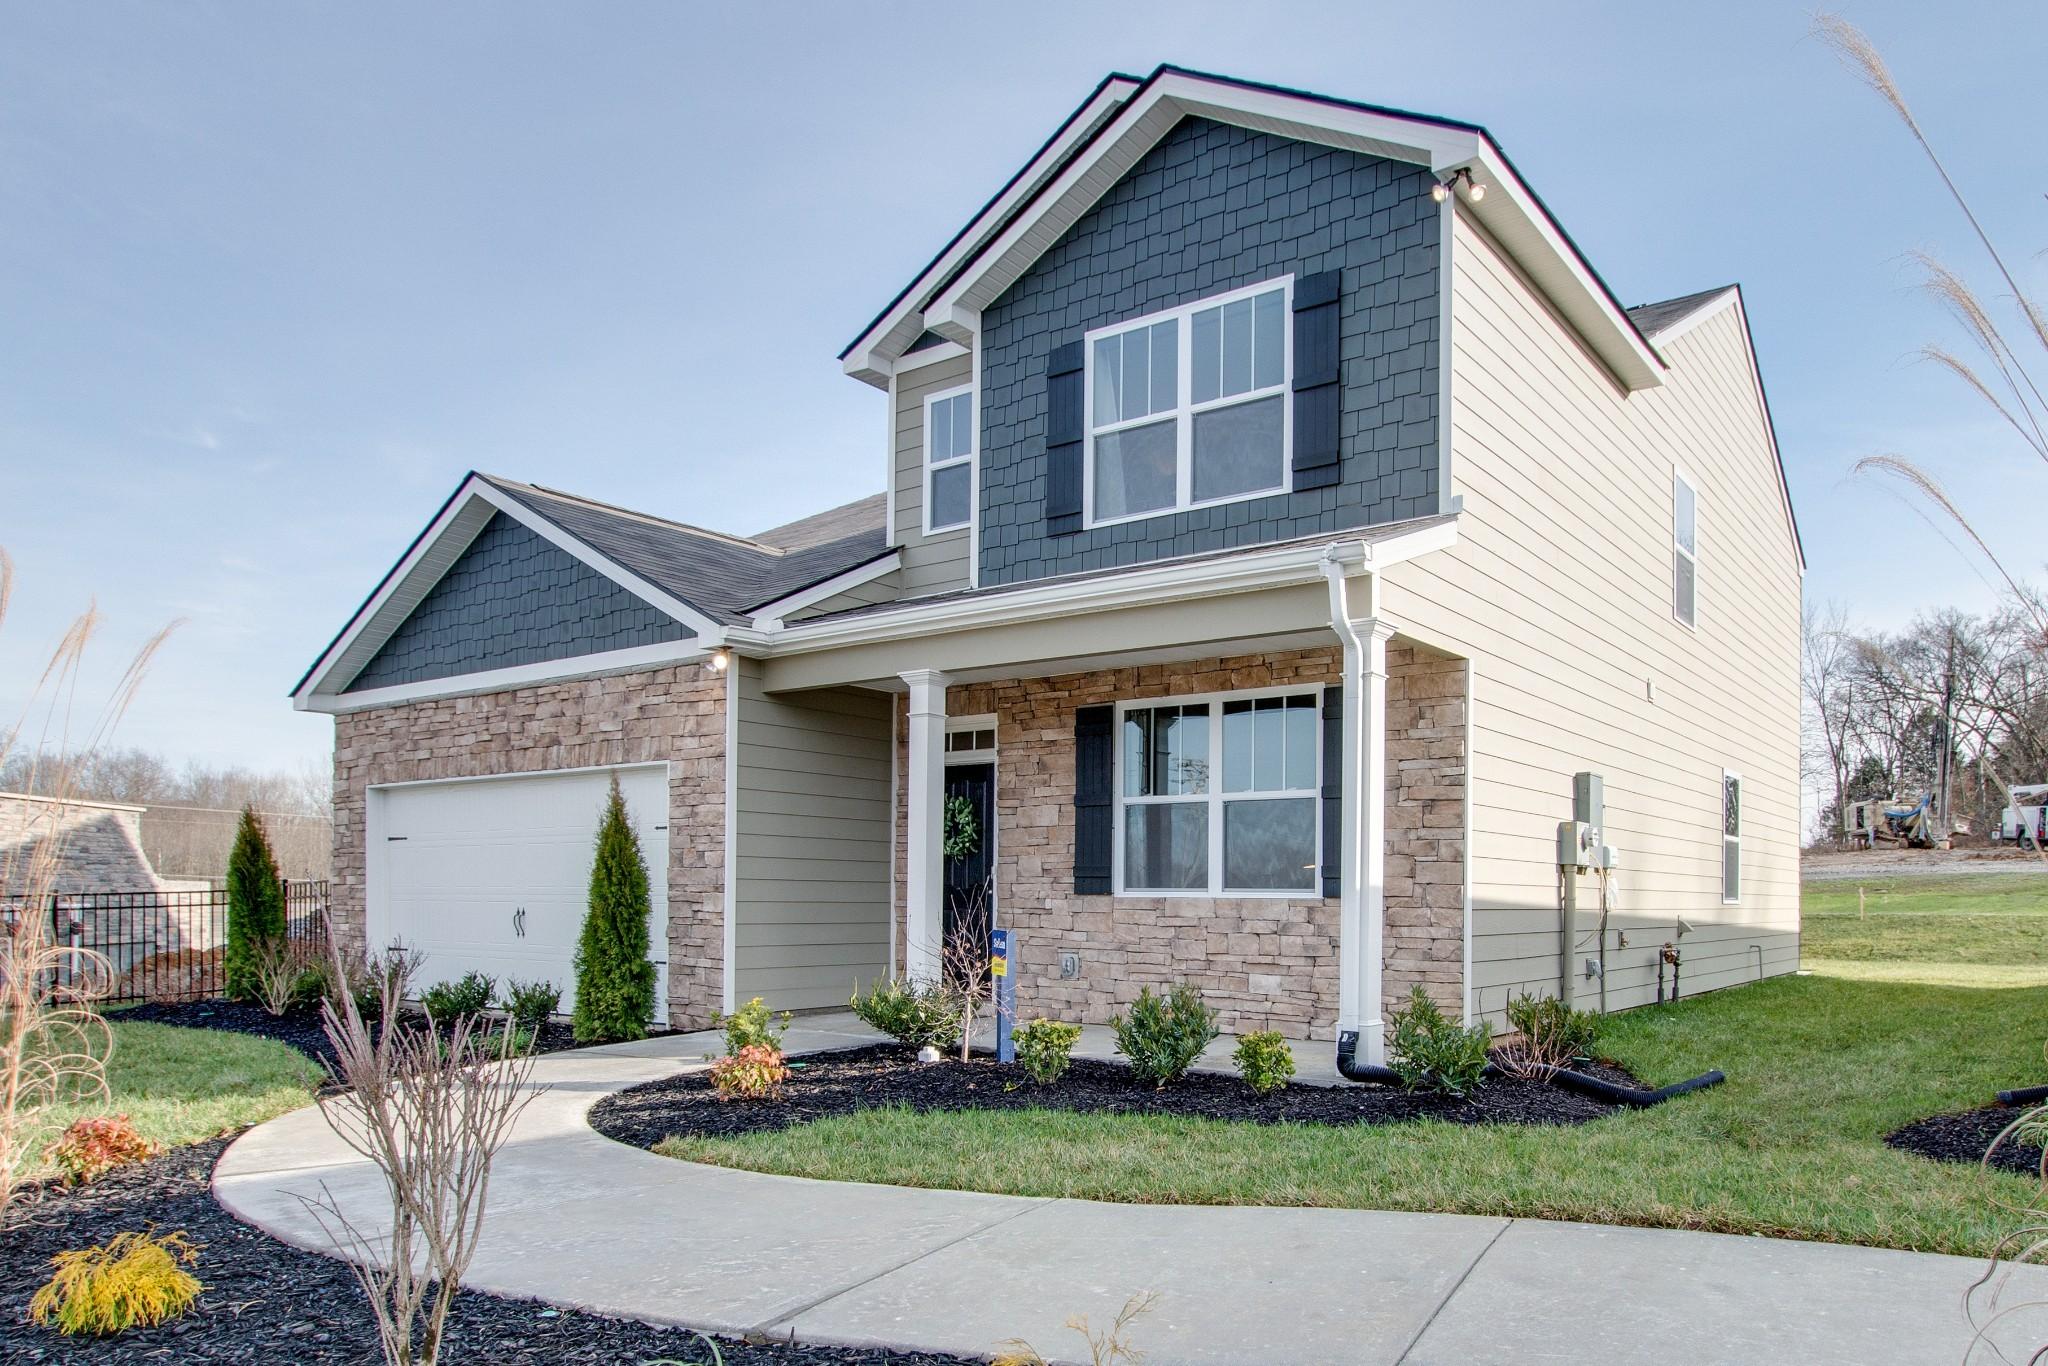 1009 Alta Vista Lane, #02 Property Photo - Smyrna, TN real estate listing